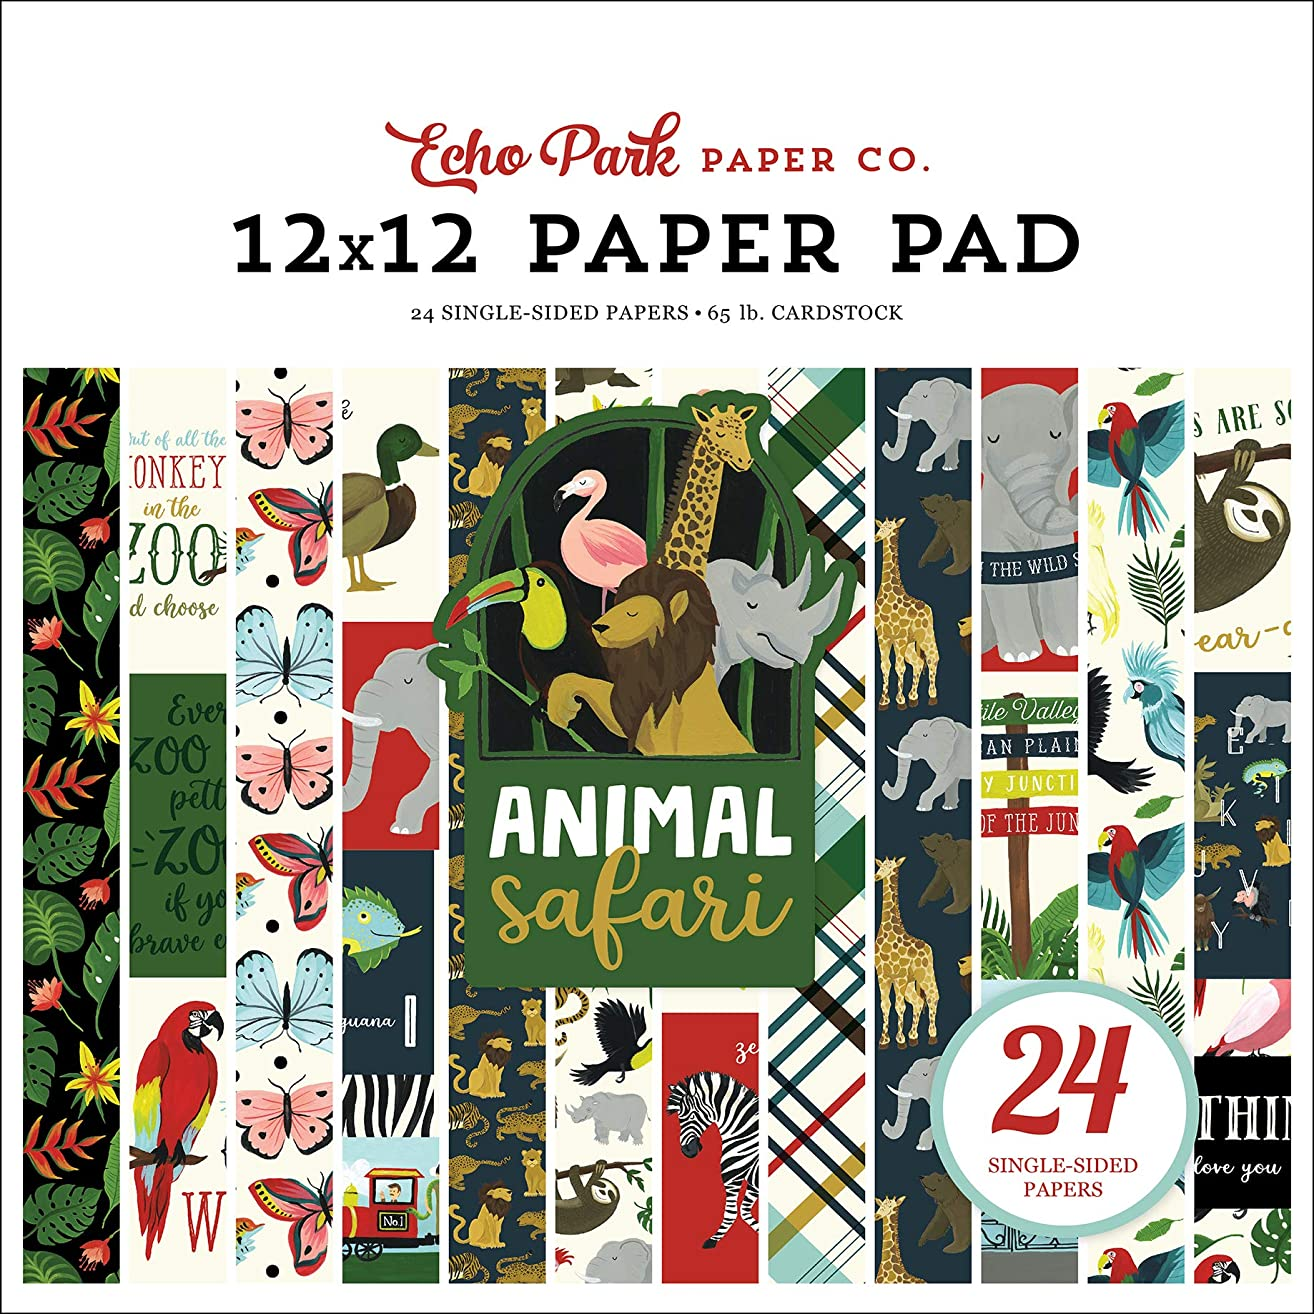 Echo Park Paper Company ZOO167030 Animal Safari 12X12 Pad Paper Green, Navy, Blue, Yellow, red, Pink prjuao8423574915